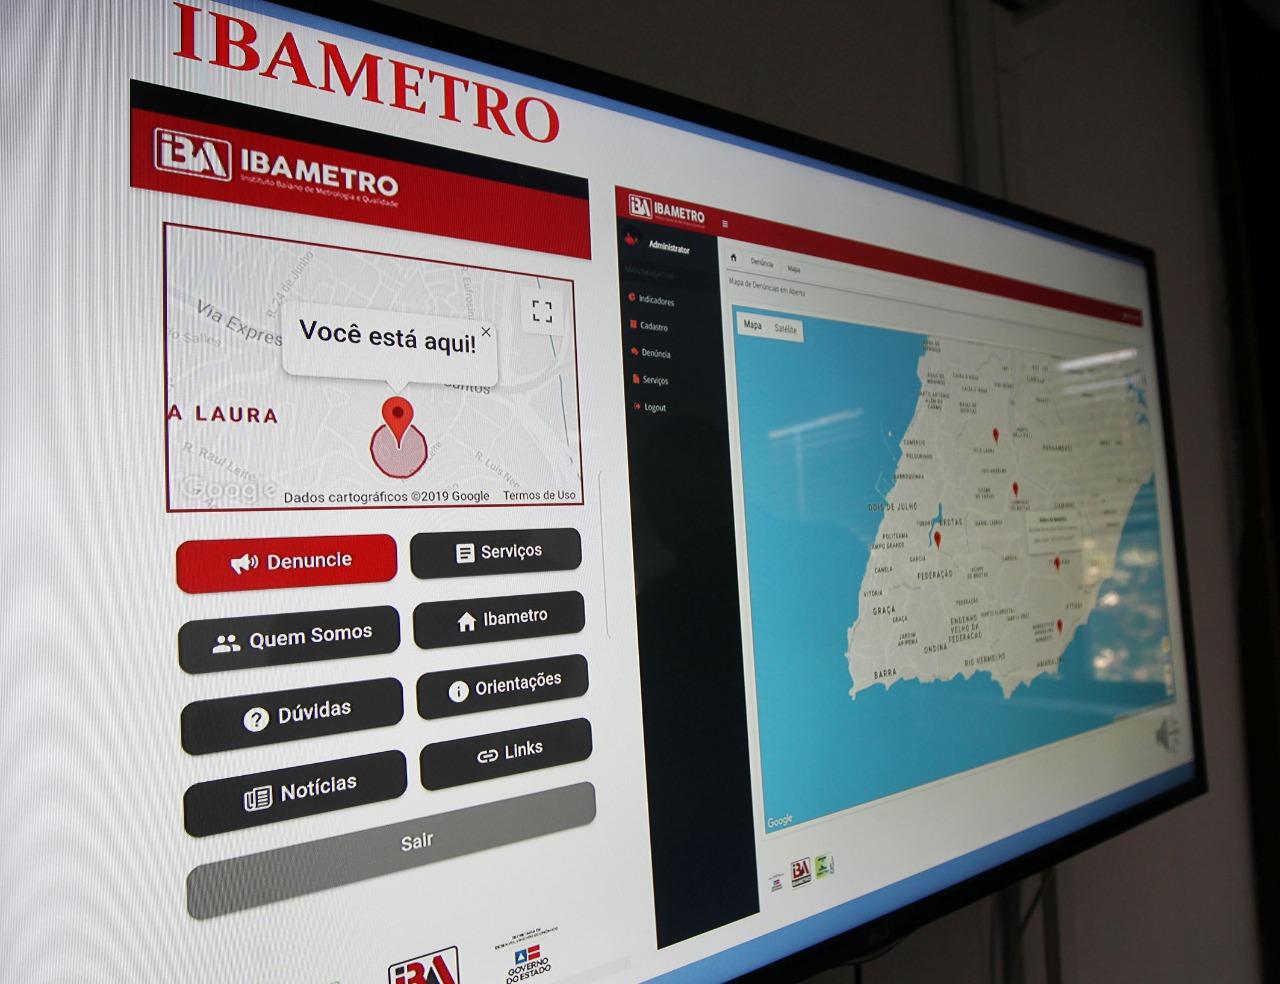 Ibametro-lana-aplicativo-para-denncias-da-populao